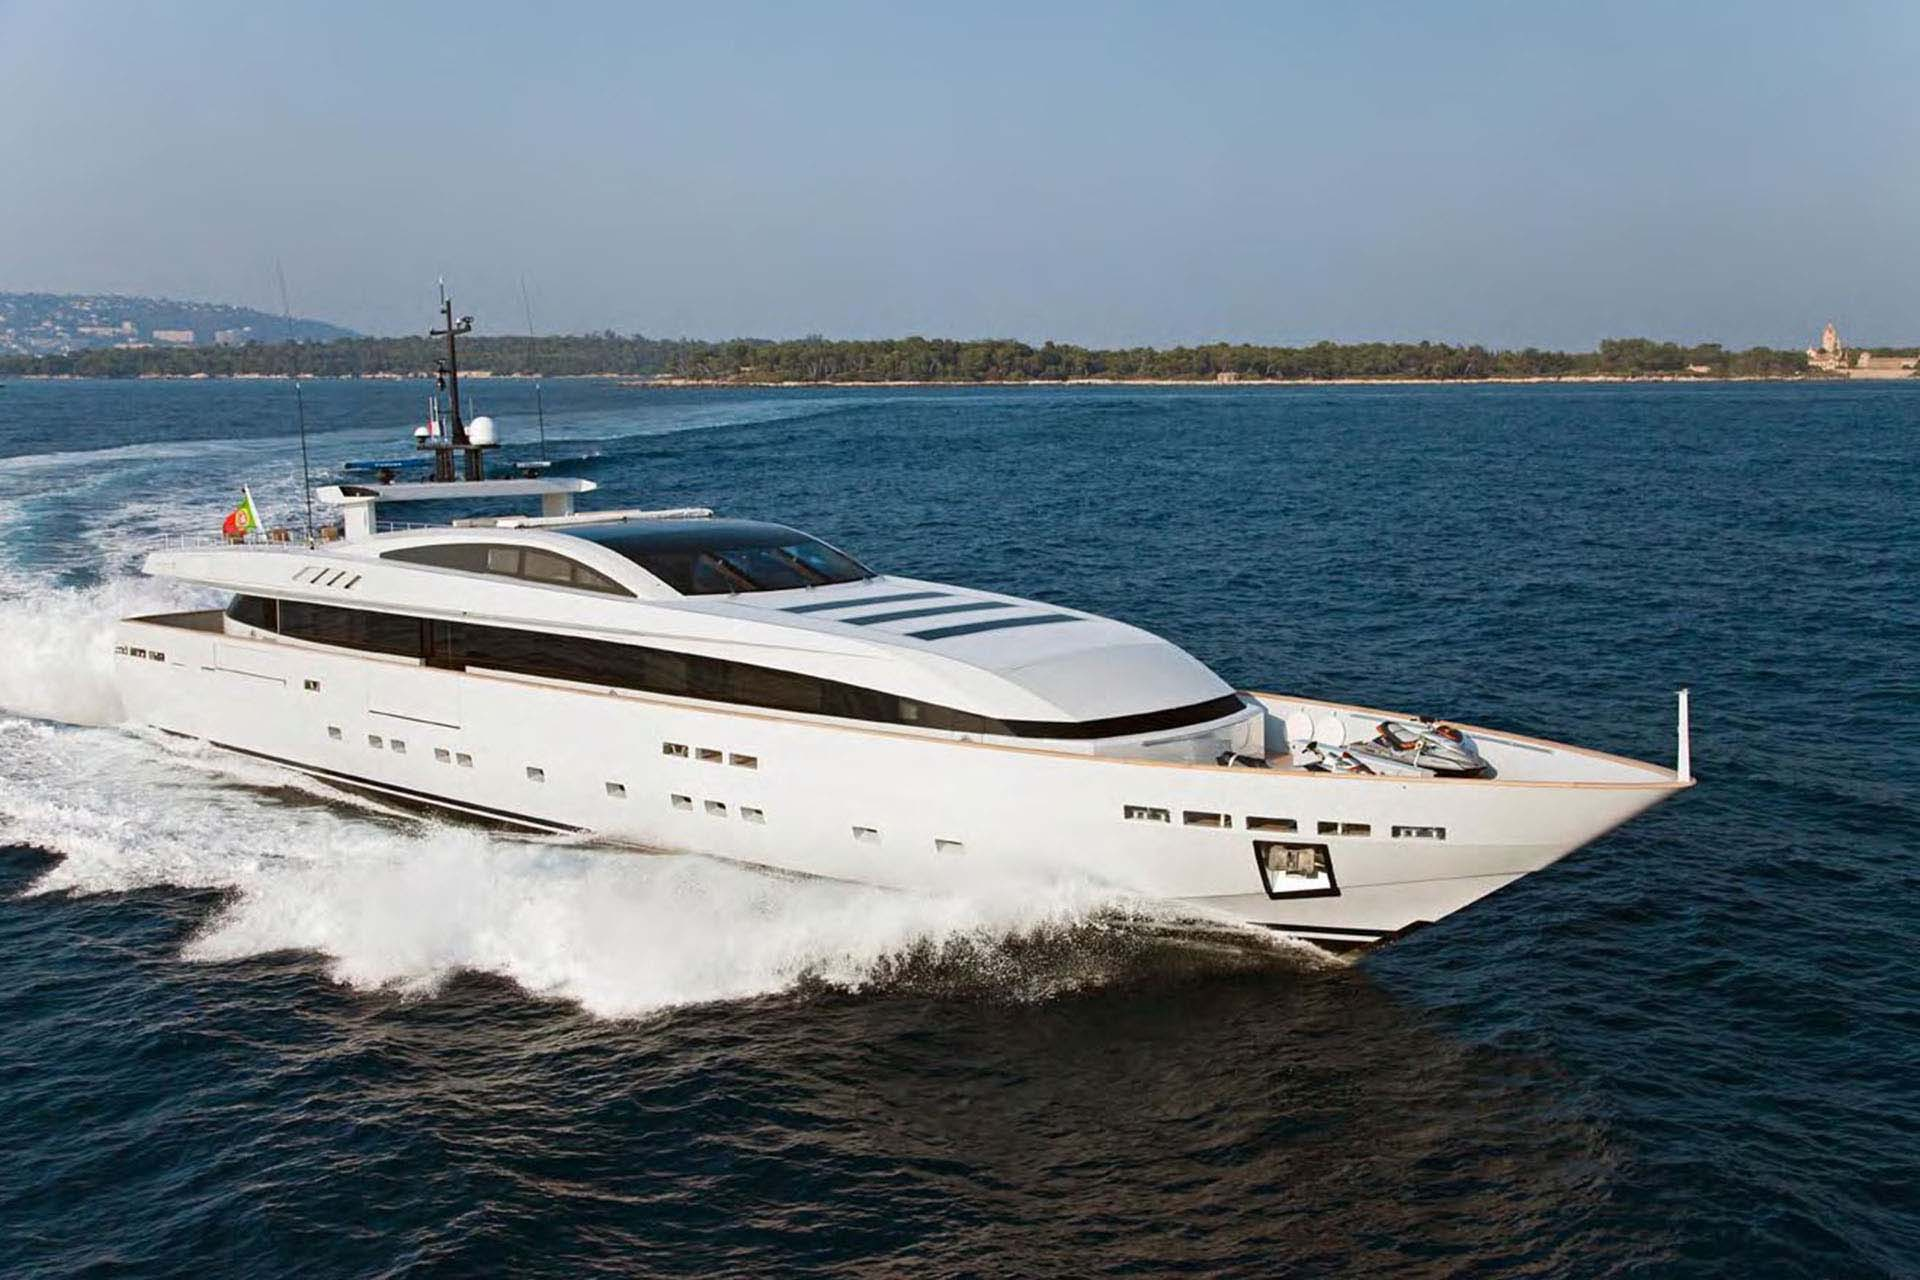 baglietto - APACHE II - Paskowsky Yacht Design